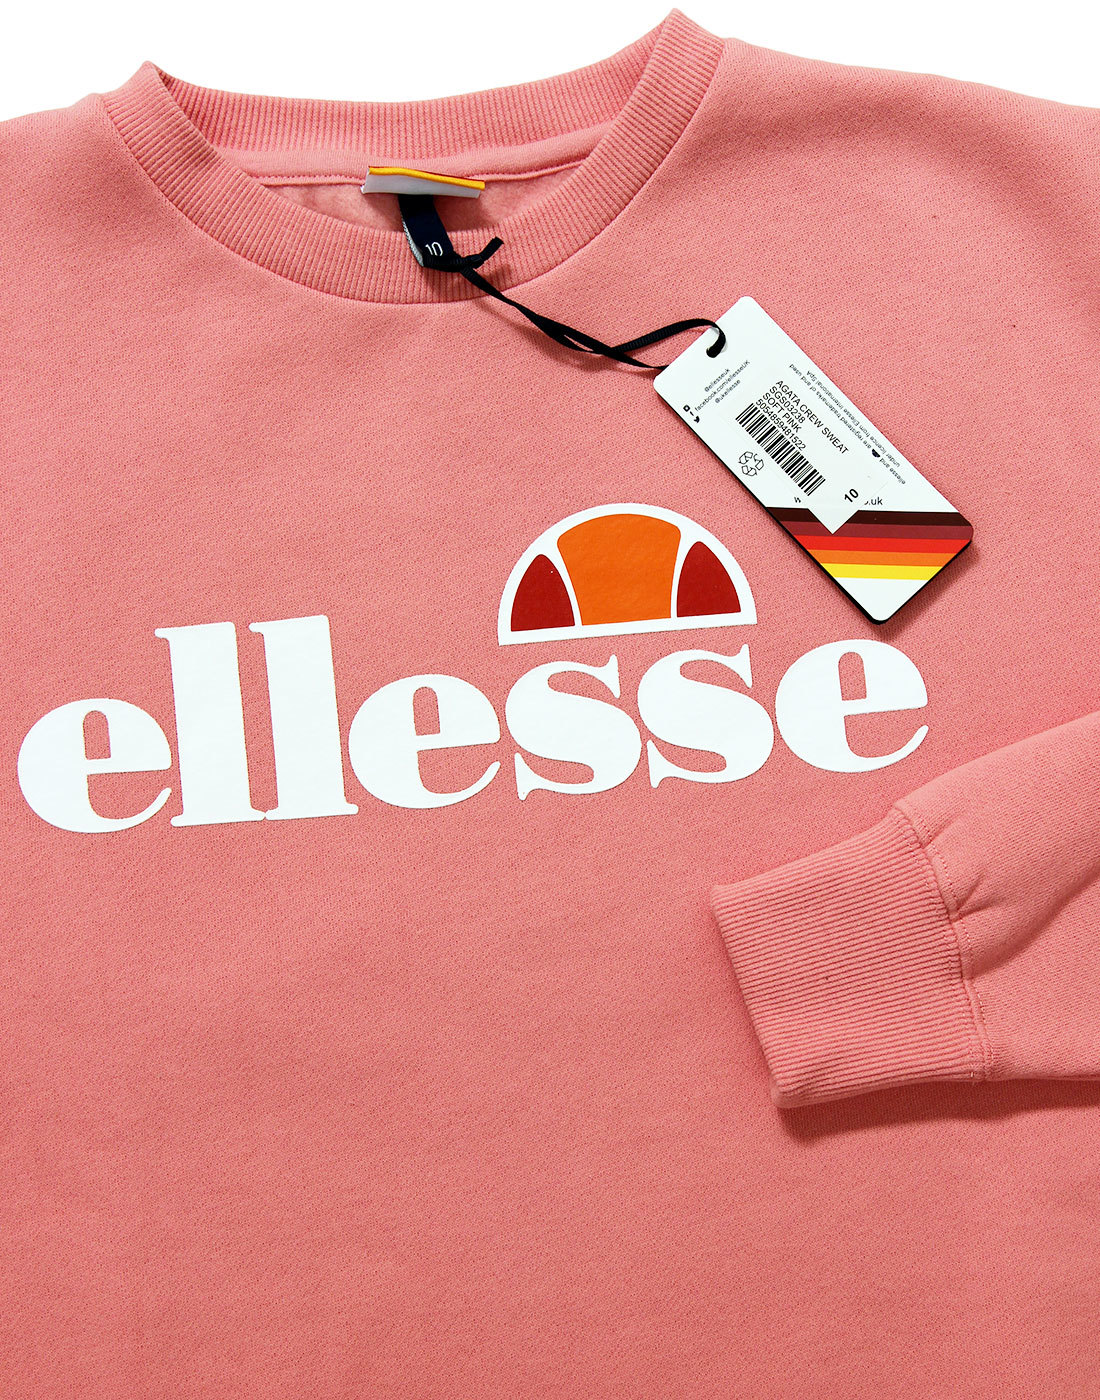 79b83835 ELLESSE WOMENS Agata Retro 80s Sweatshirt in Candy Pink